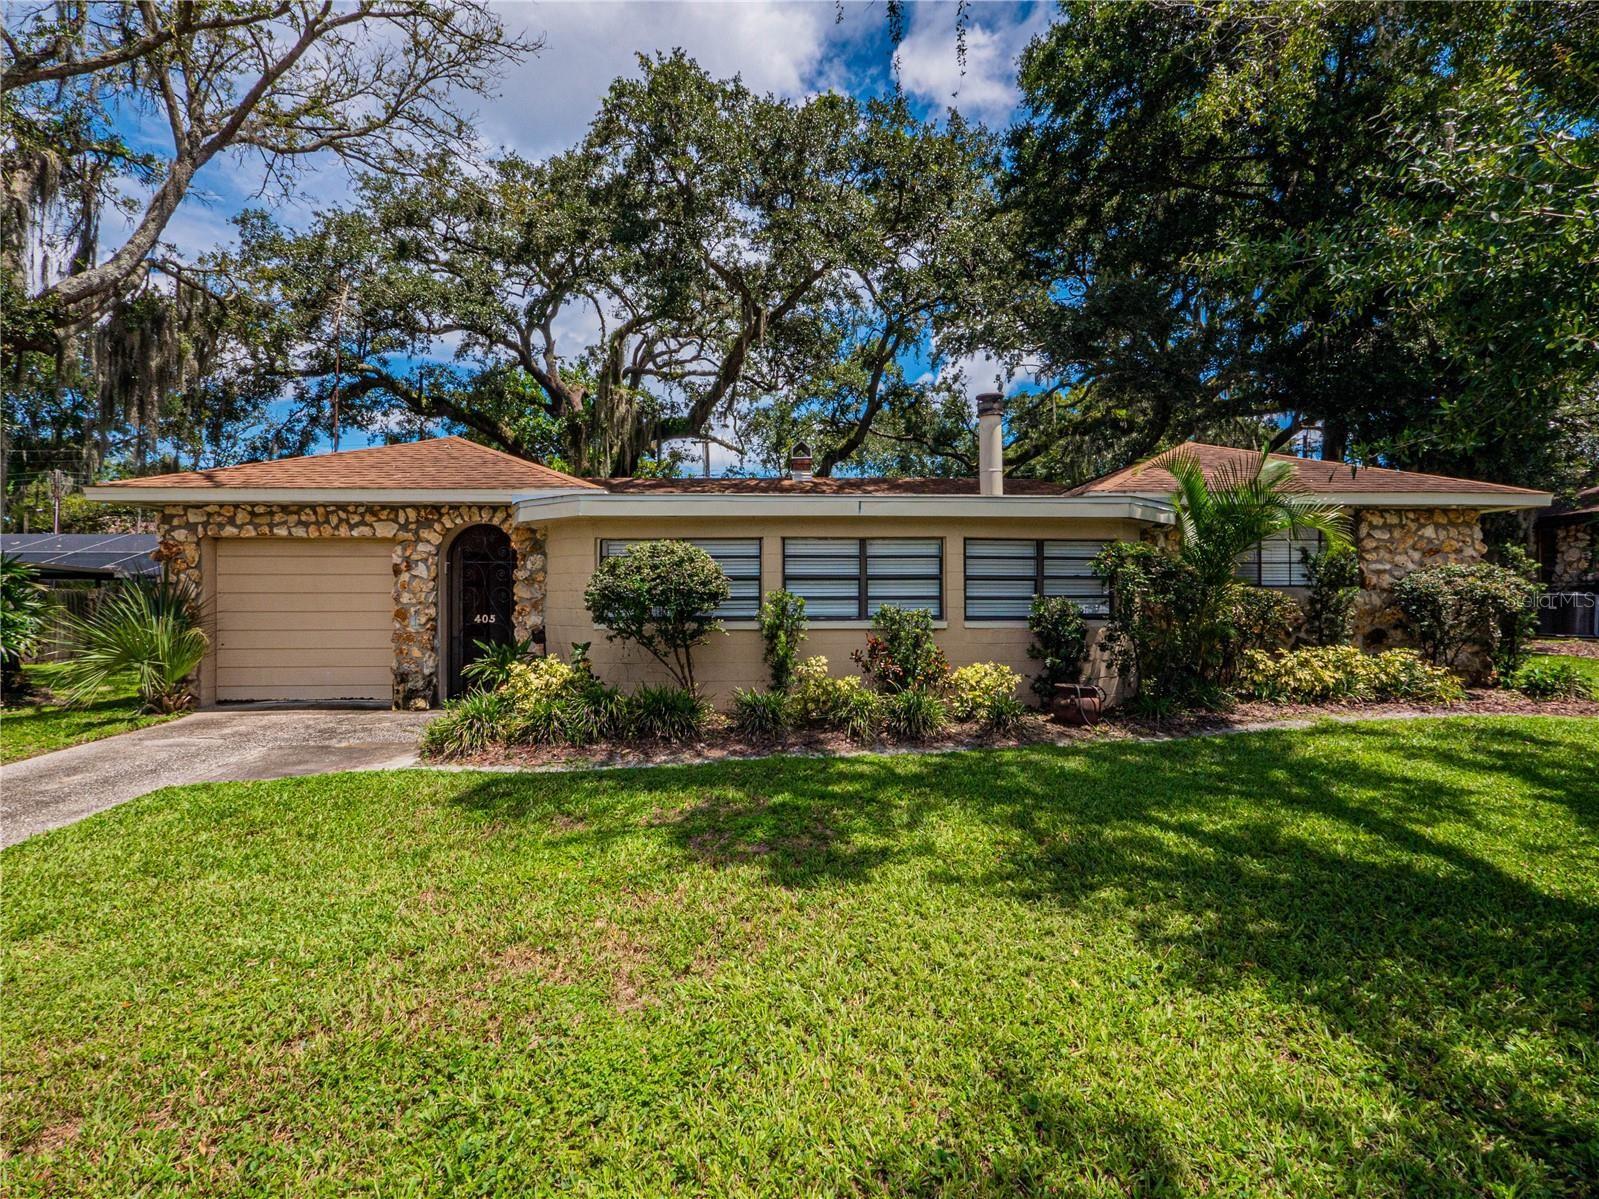 405 W BEACON ROAD, Lakeland, FL 33803 - MLS#: L4924108